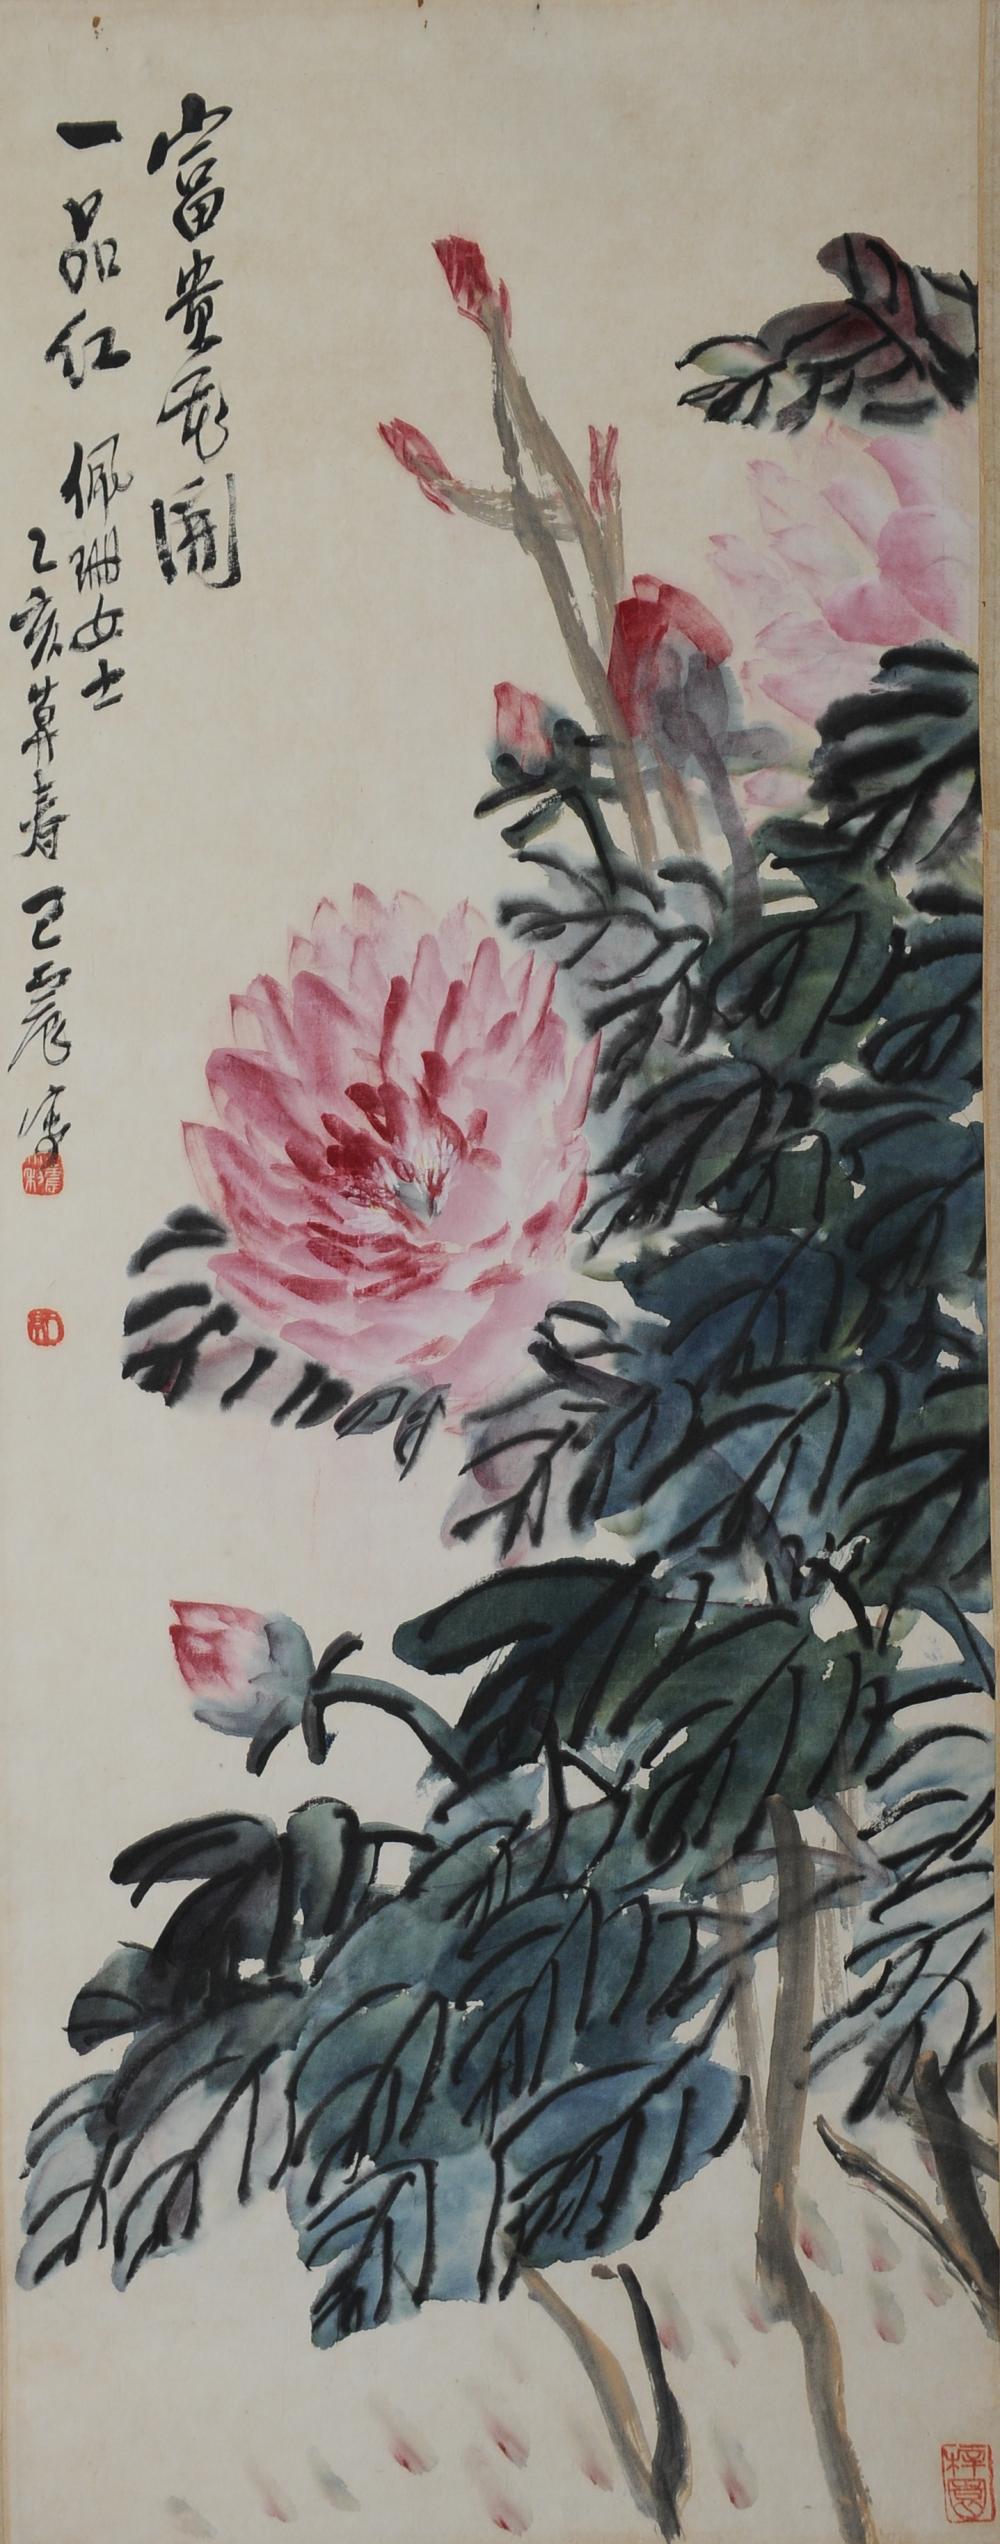 SCROLL PAINTING OF FLOWERS, WANG ZHENG (1867-1938)